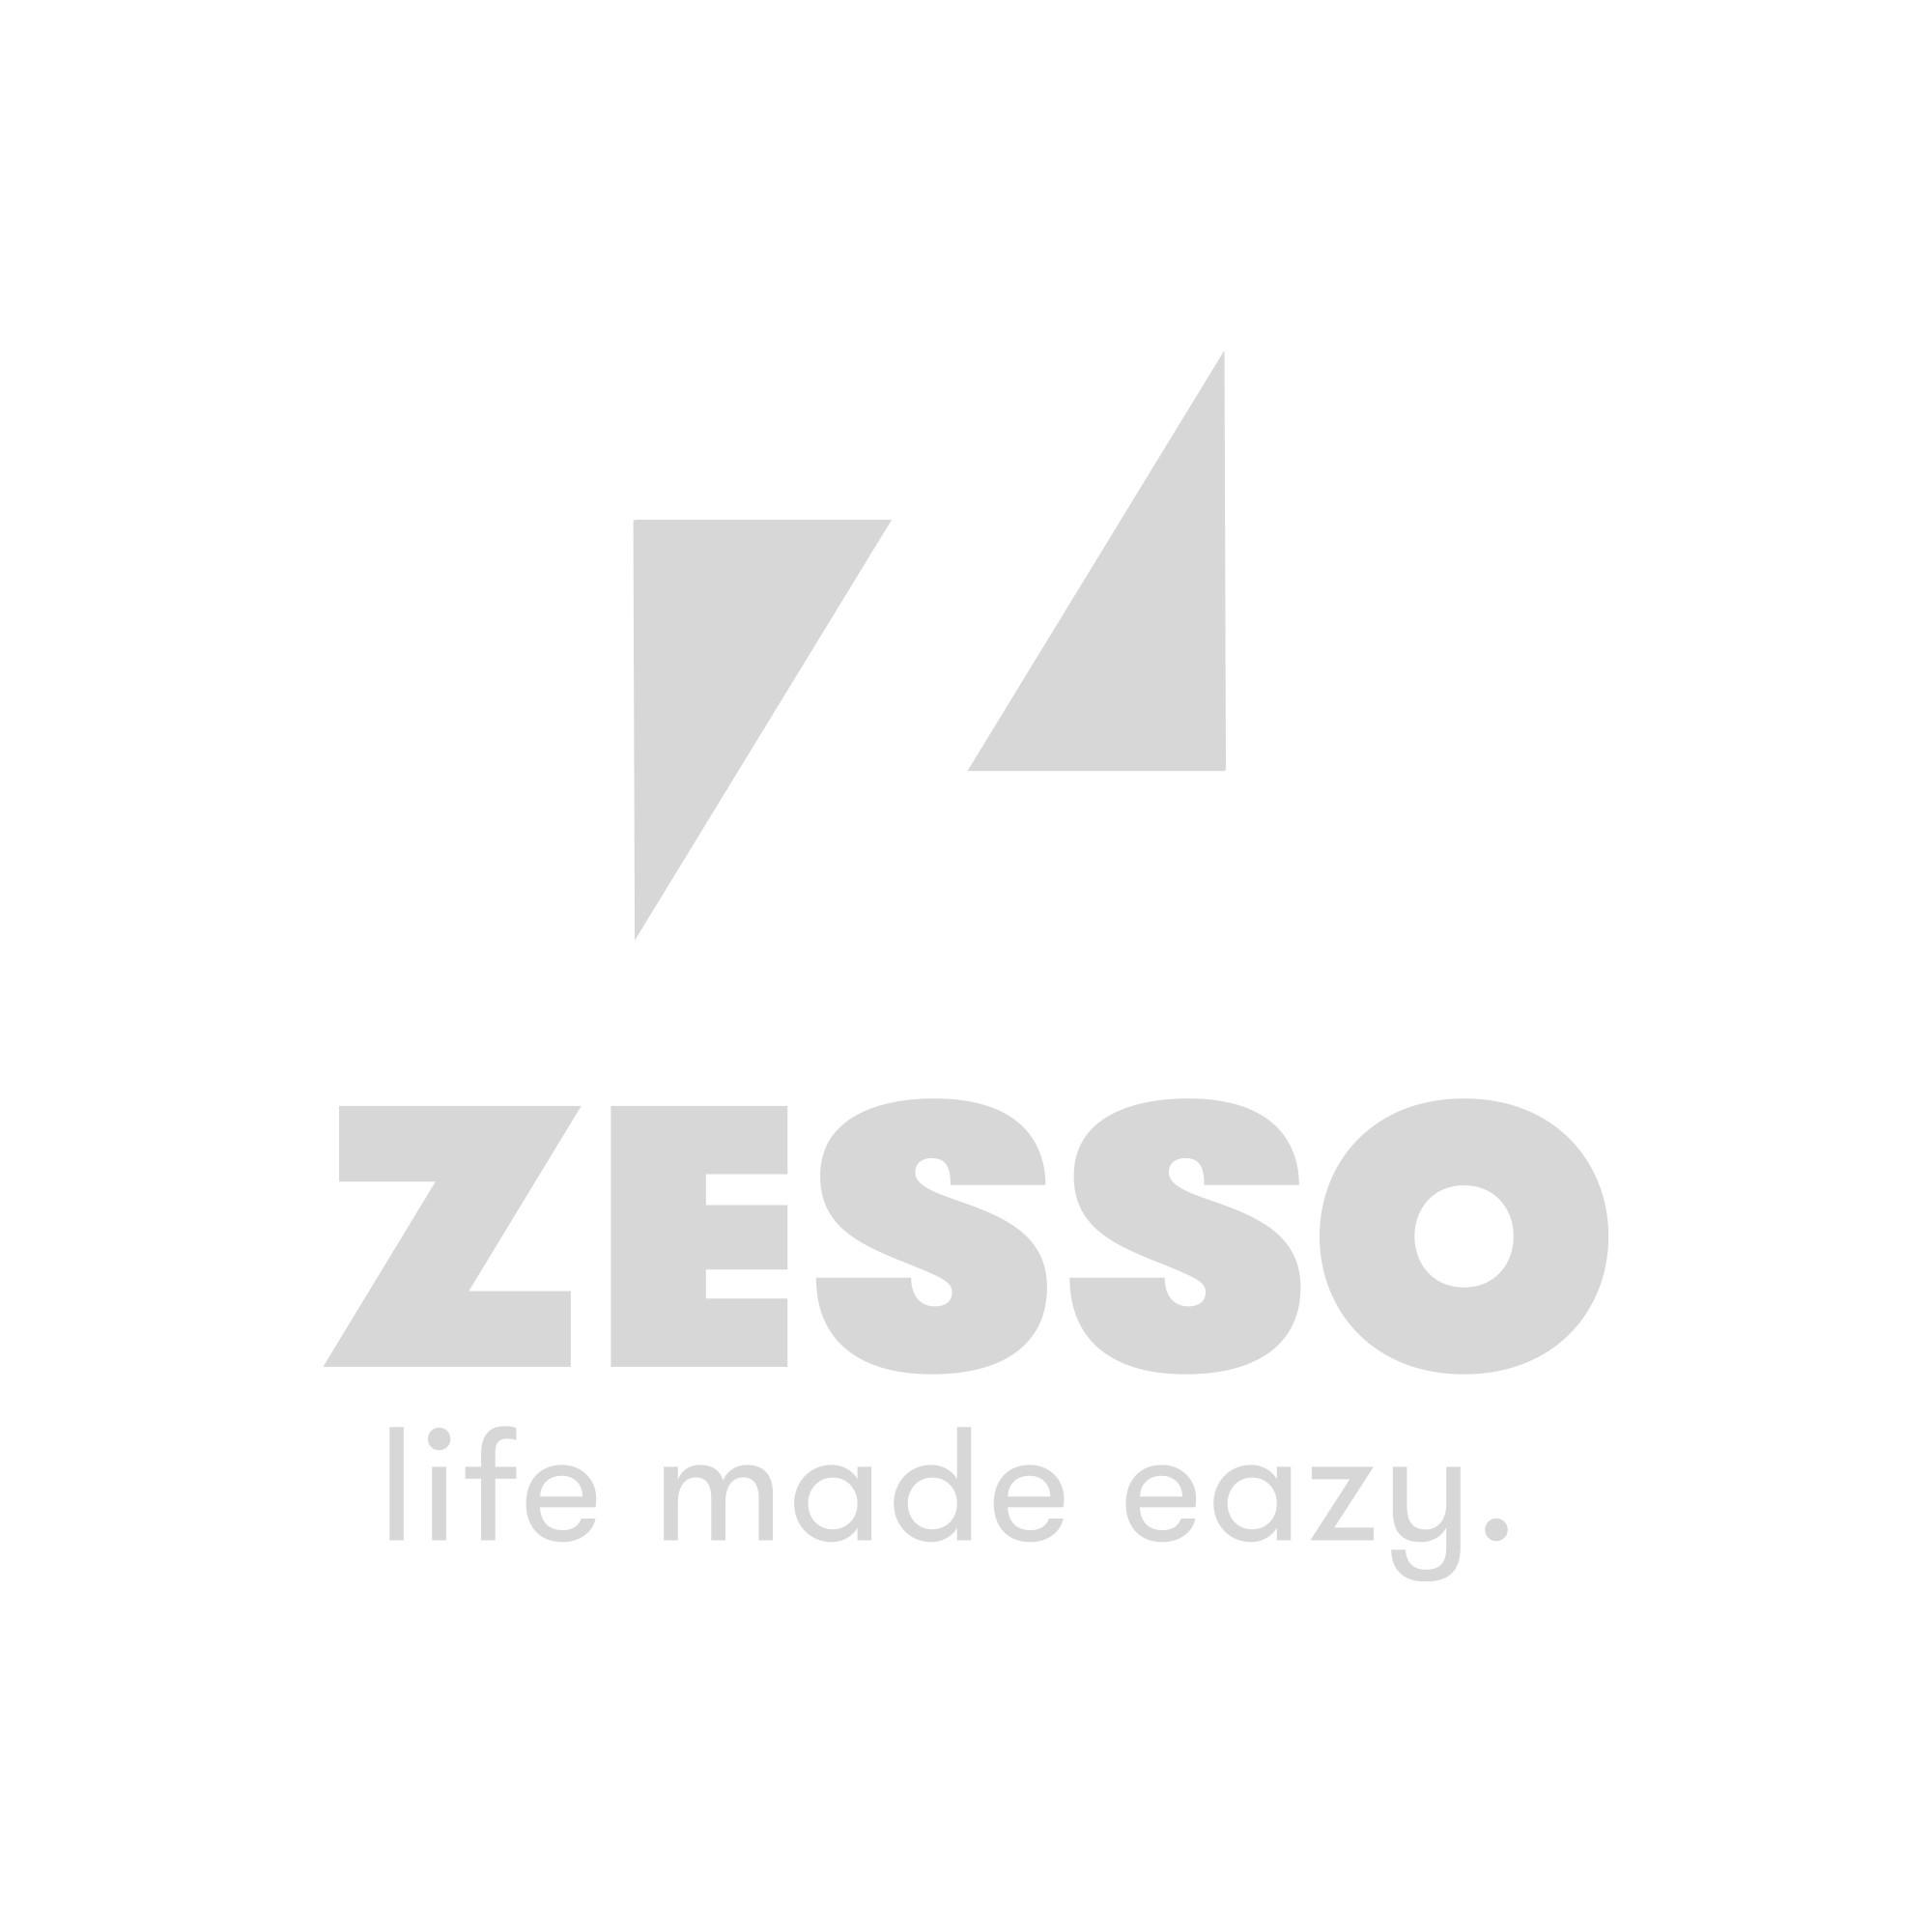 Jollein Ledikantdeken Fancy Knit Soft Grey - 120 cm x 150 cm